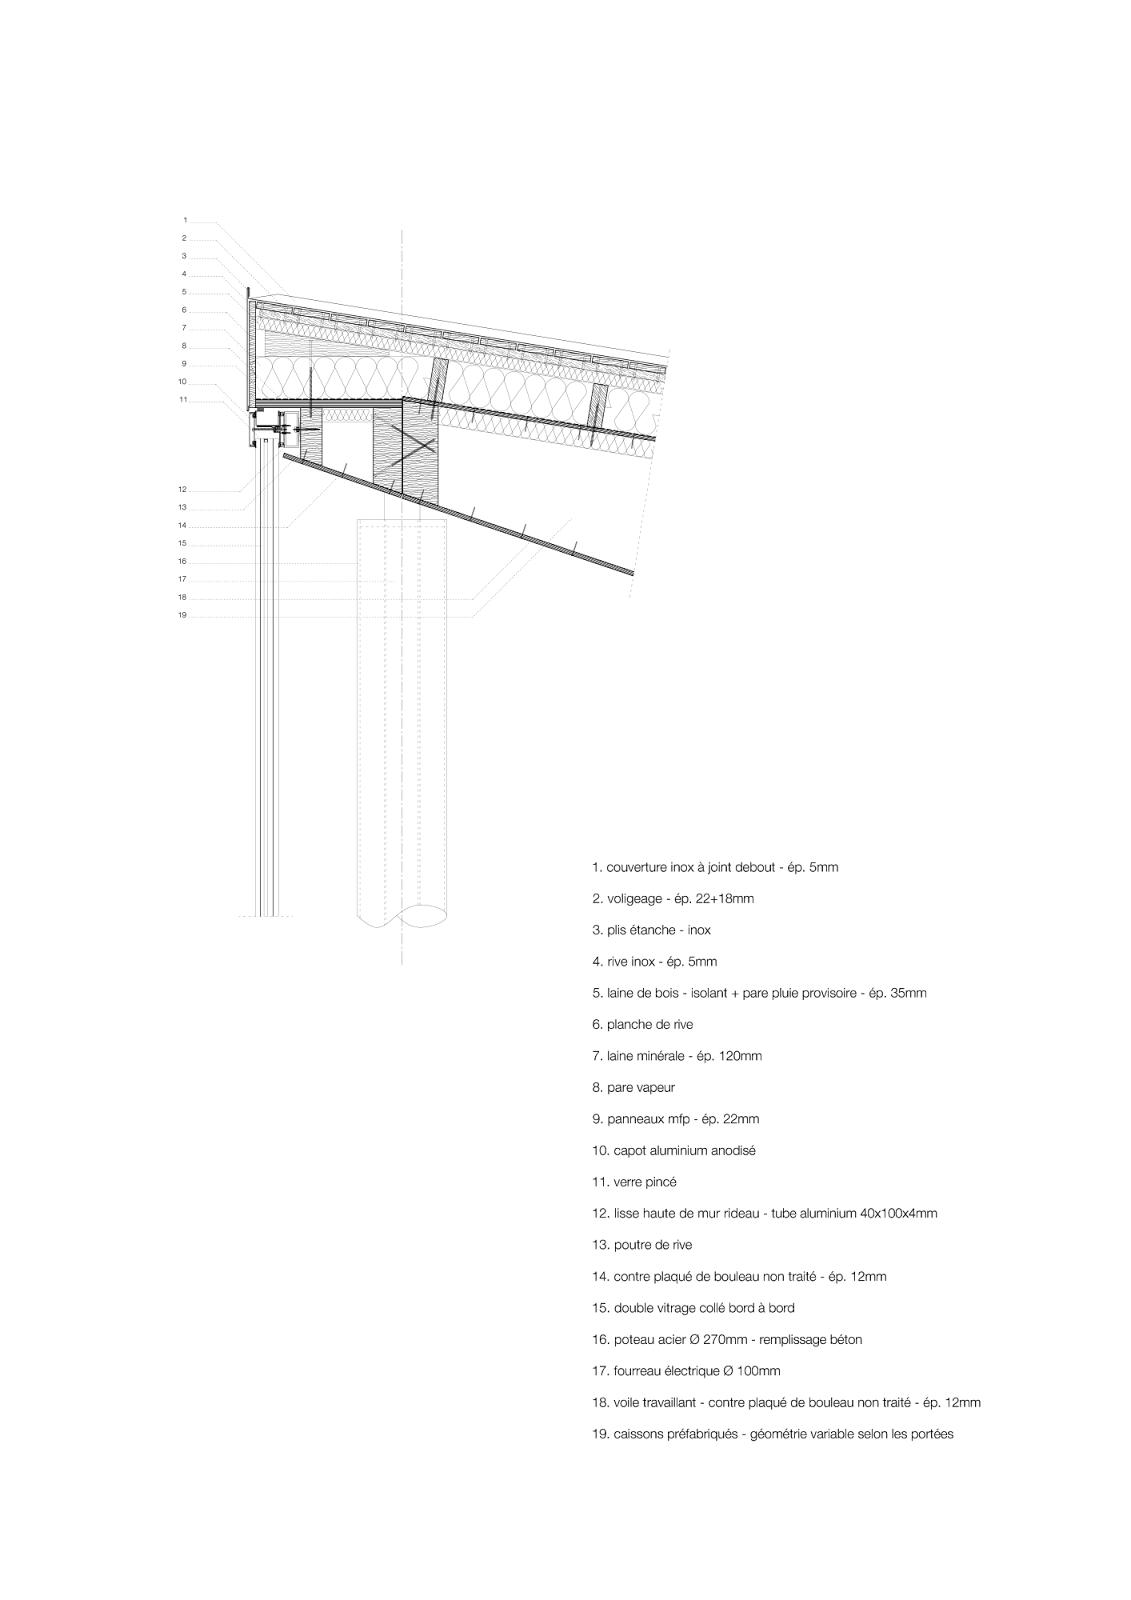 100 Corniere Inox Inegale Meuble D U0027angle Plan De